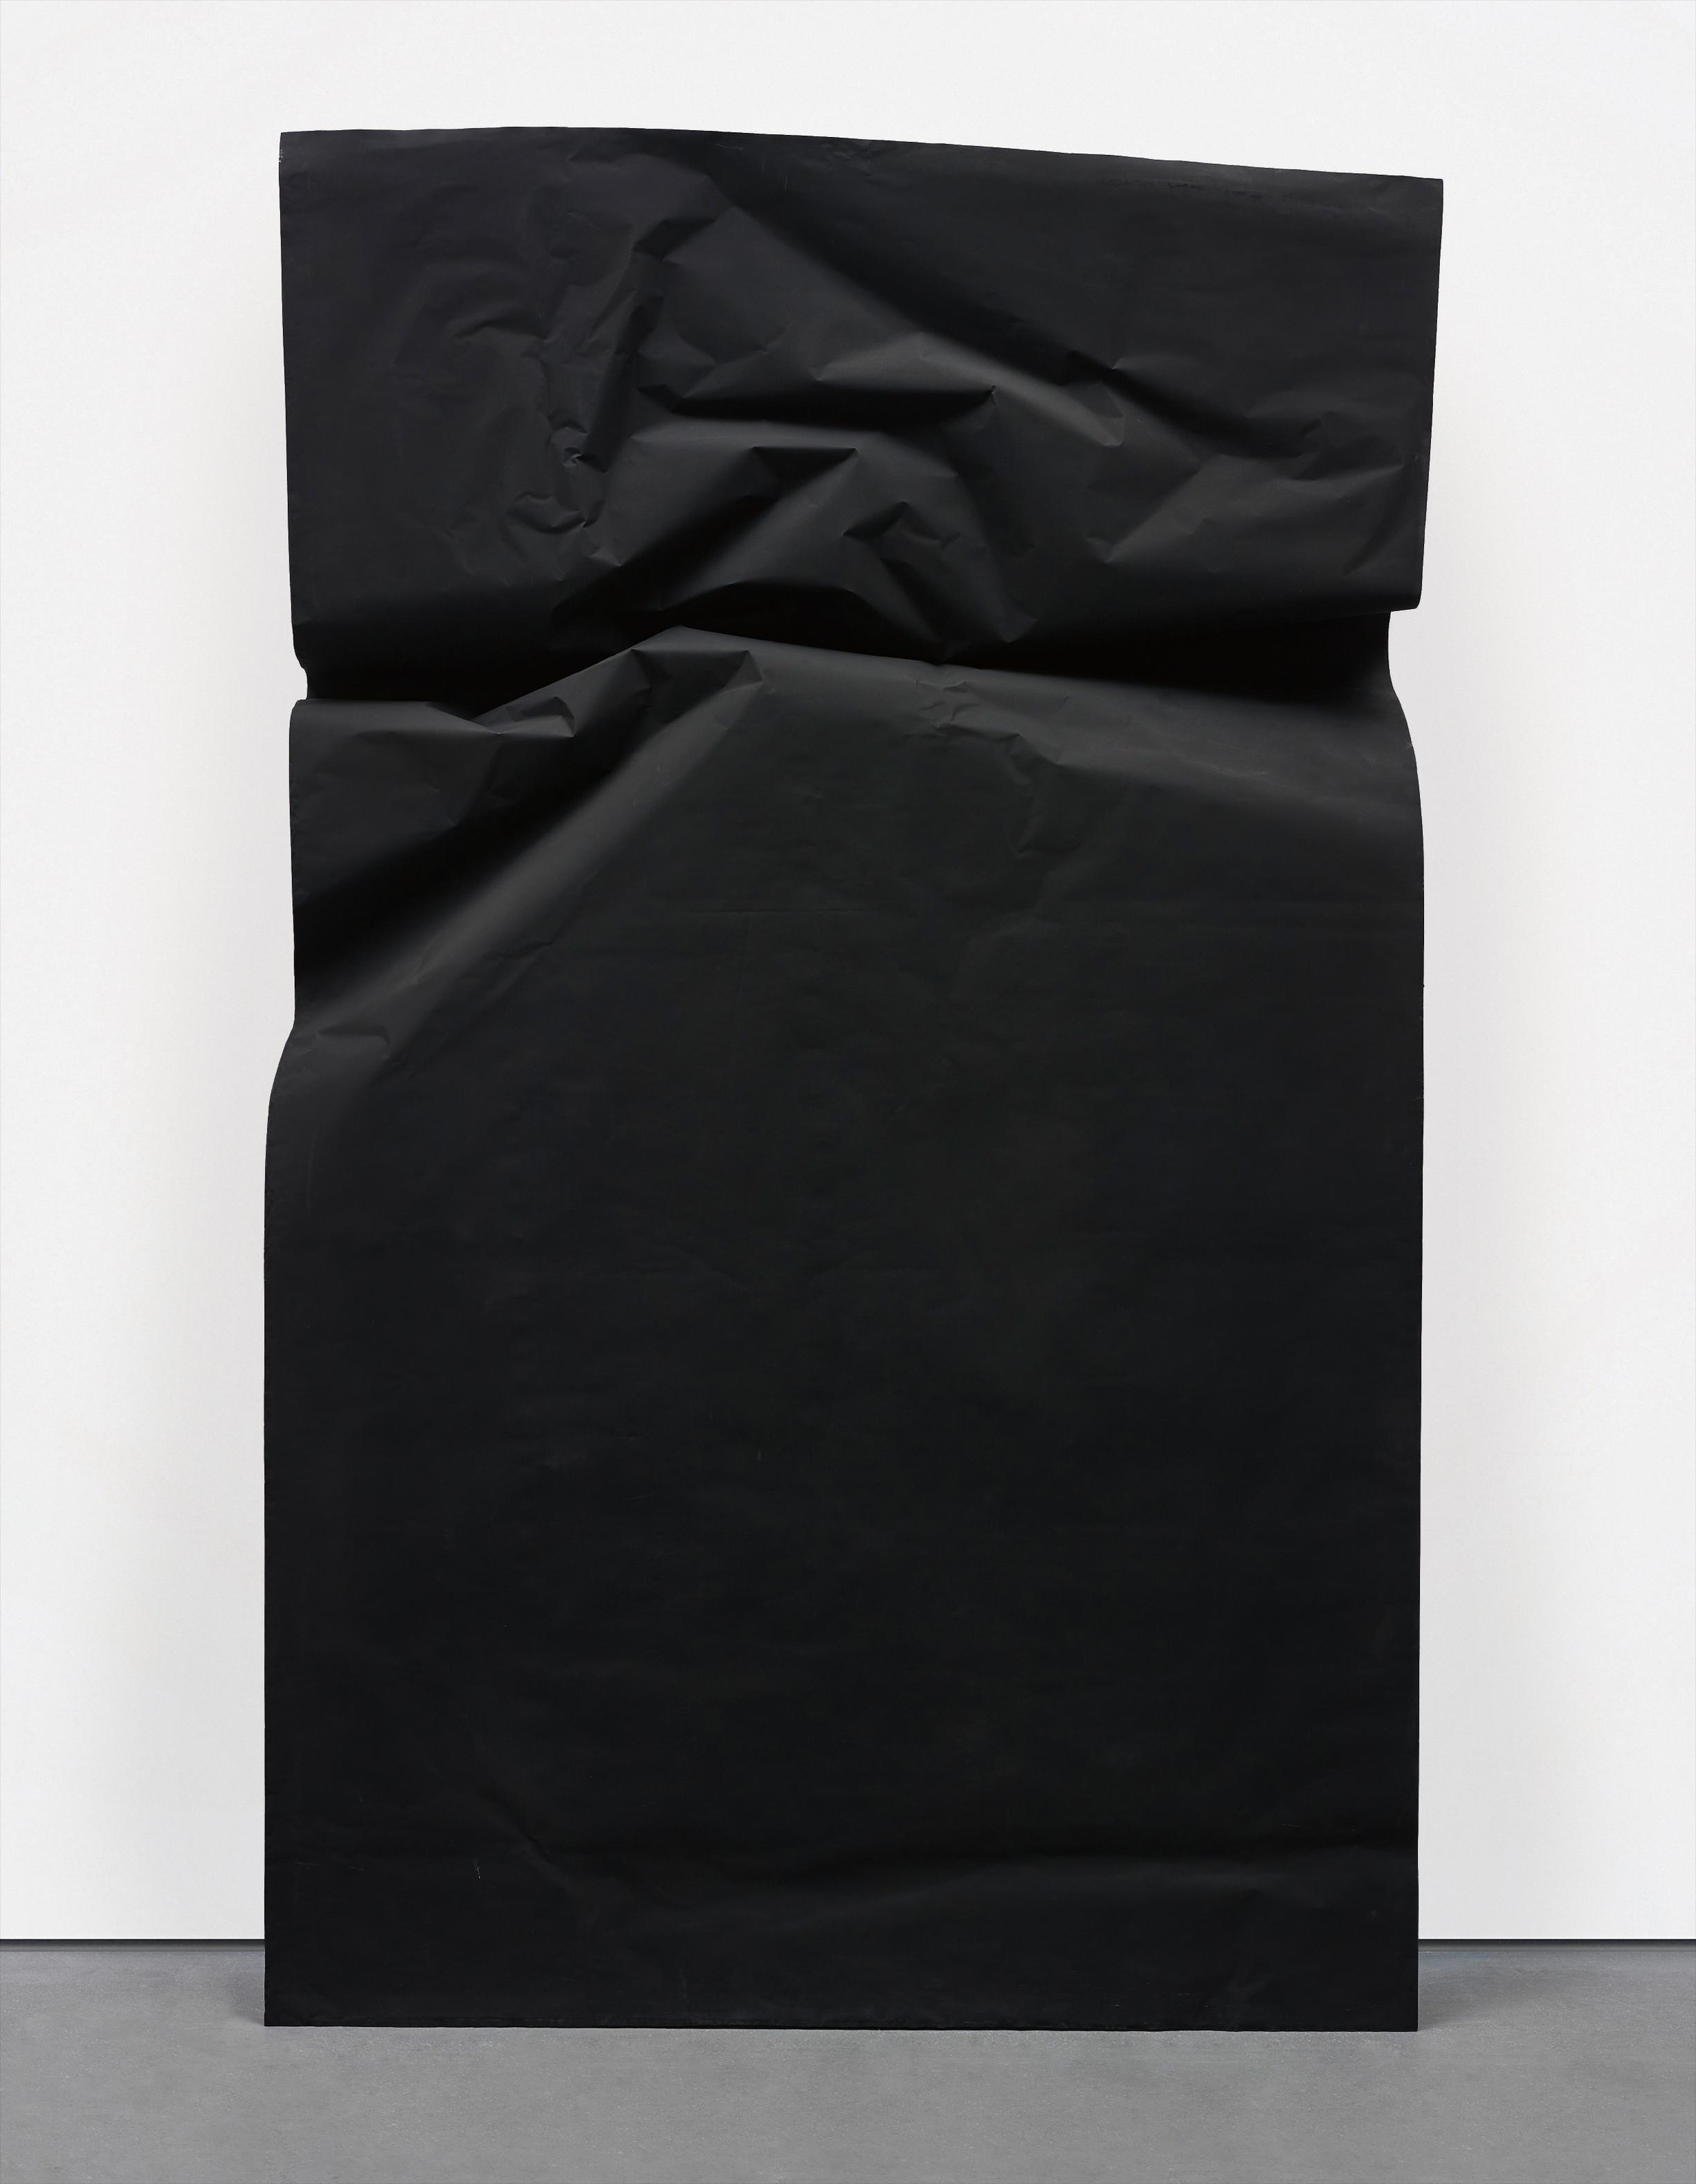 Kaari Upson-Charcoal Panel 7 (Position 1)-2012